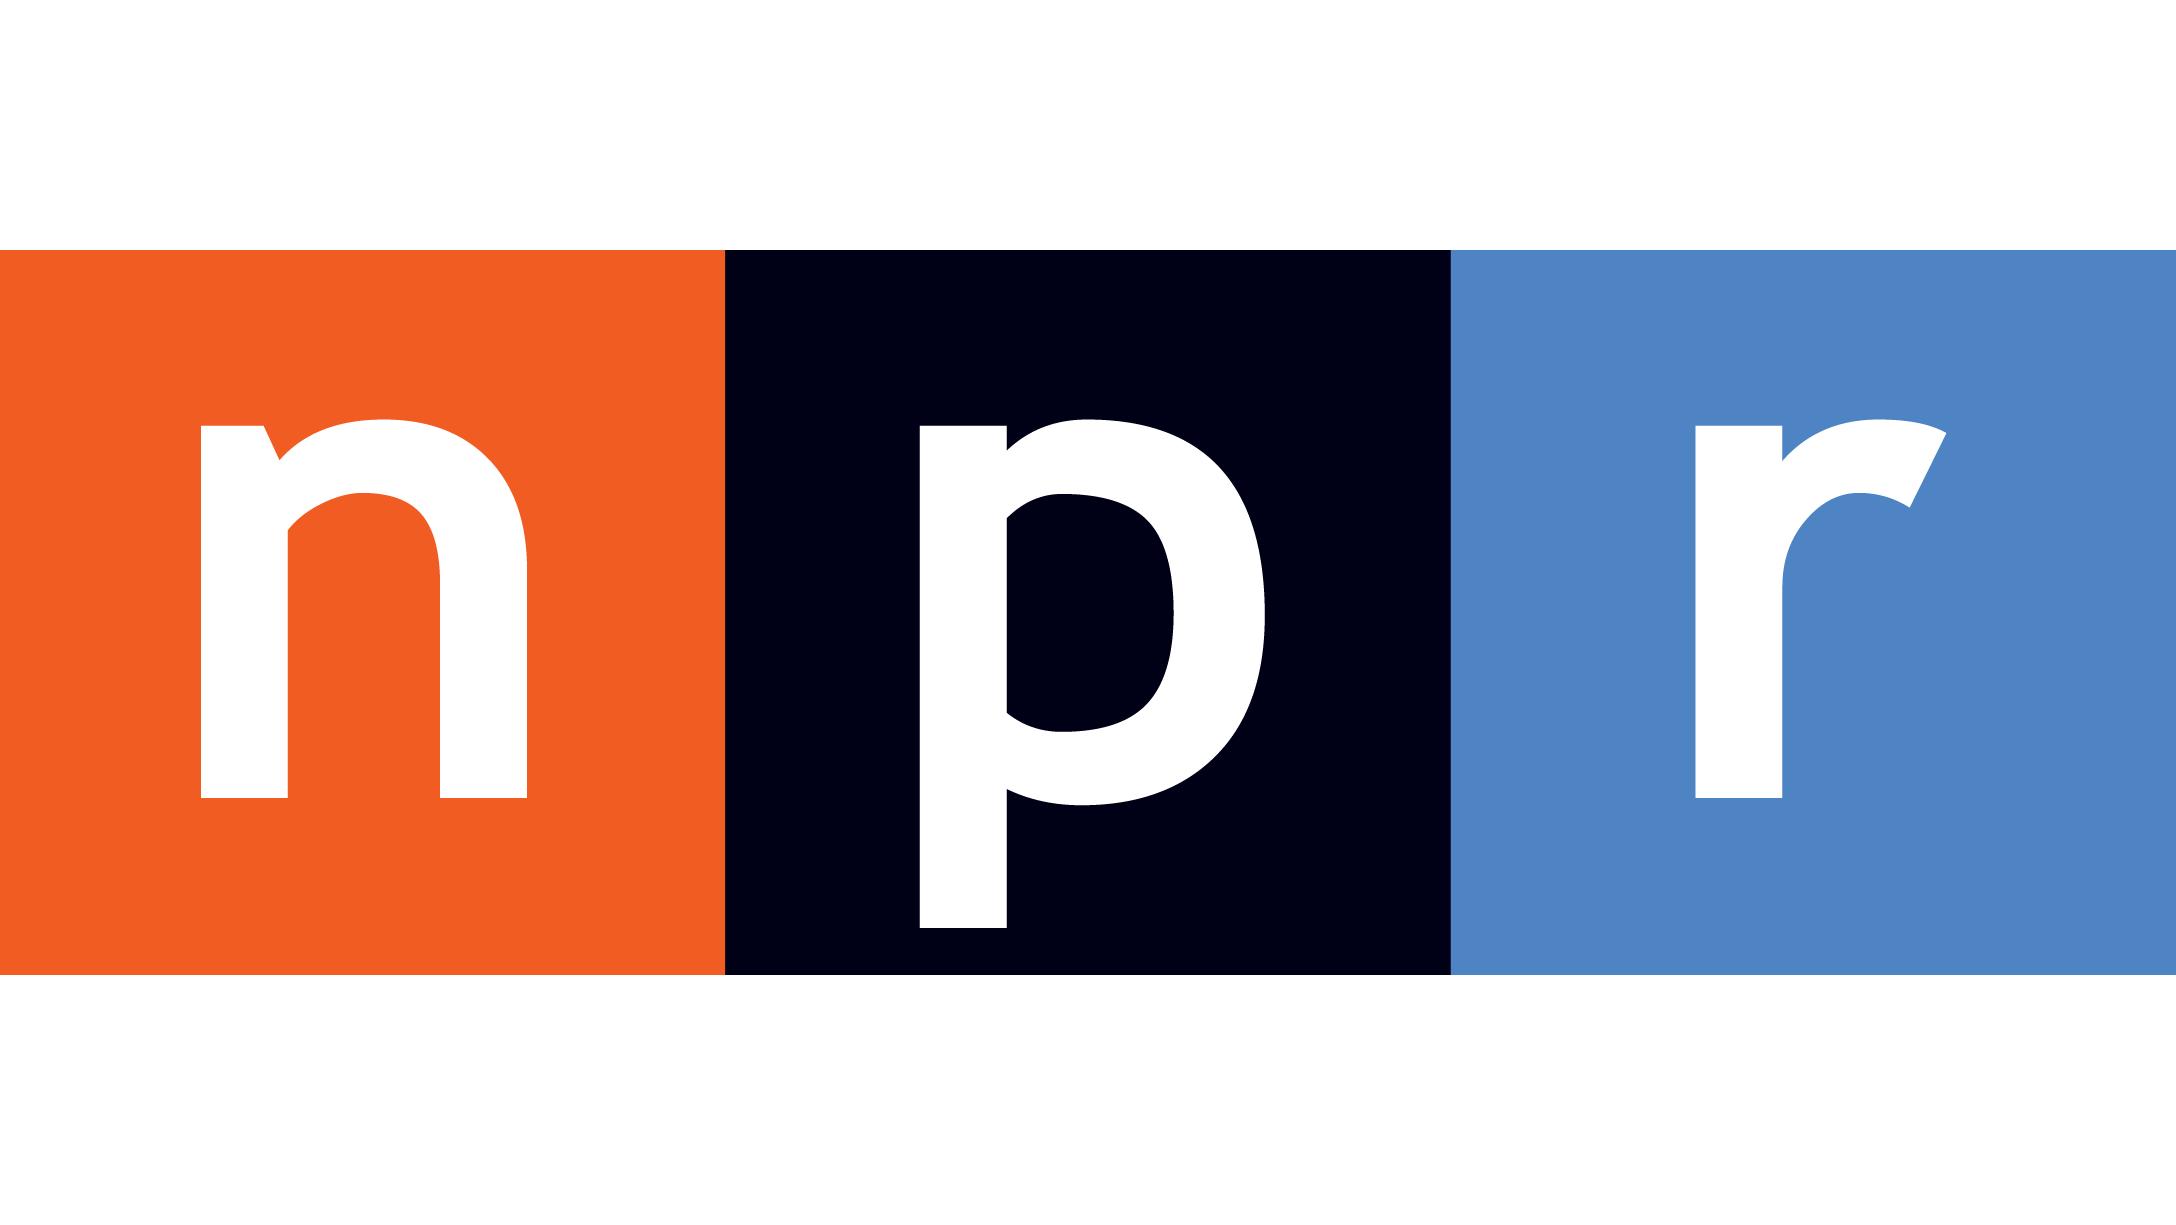 NPR June 29, 2018